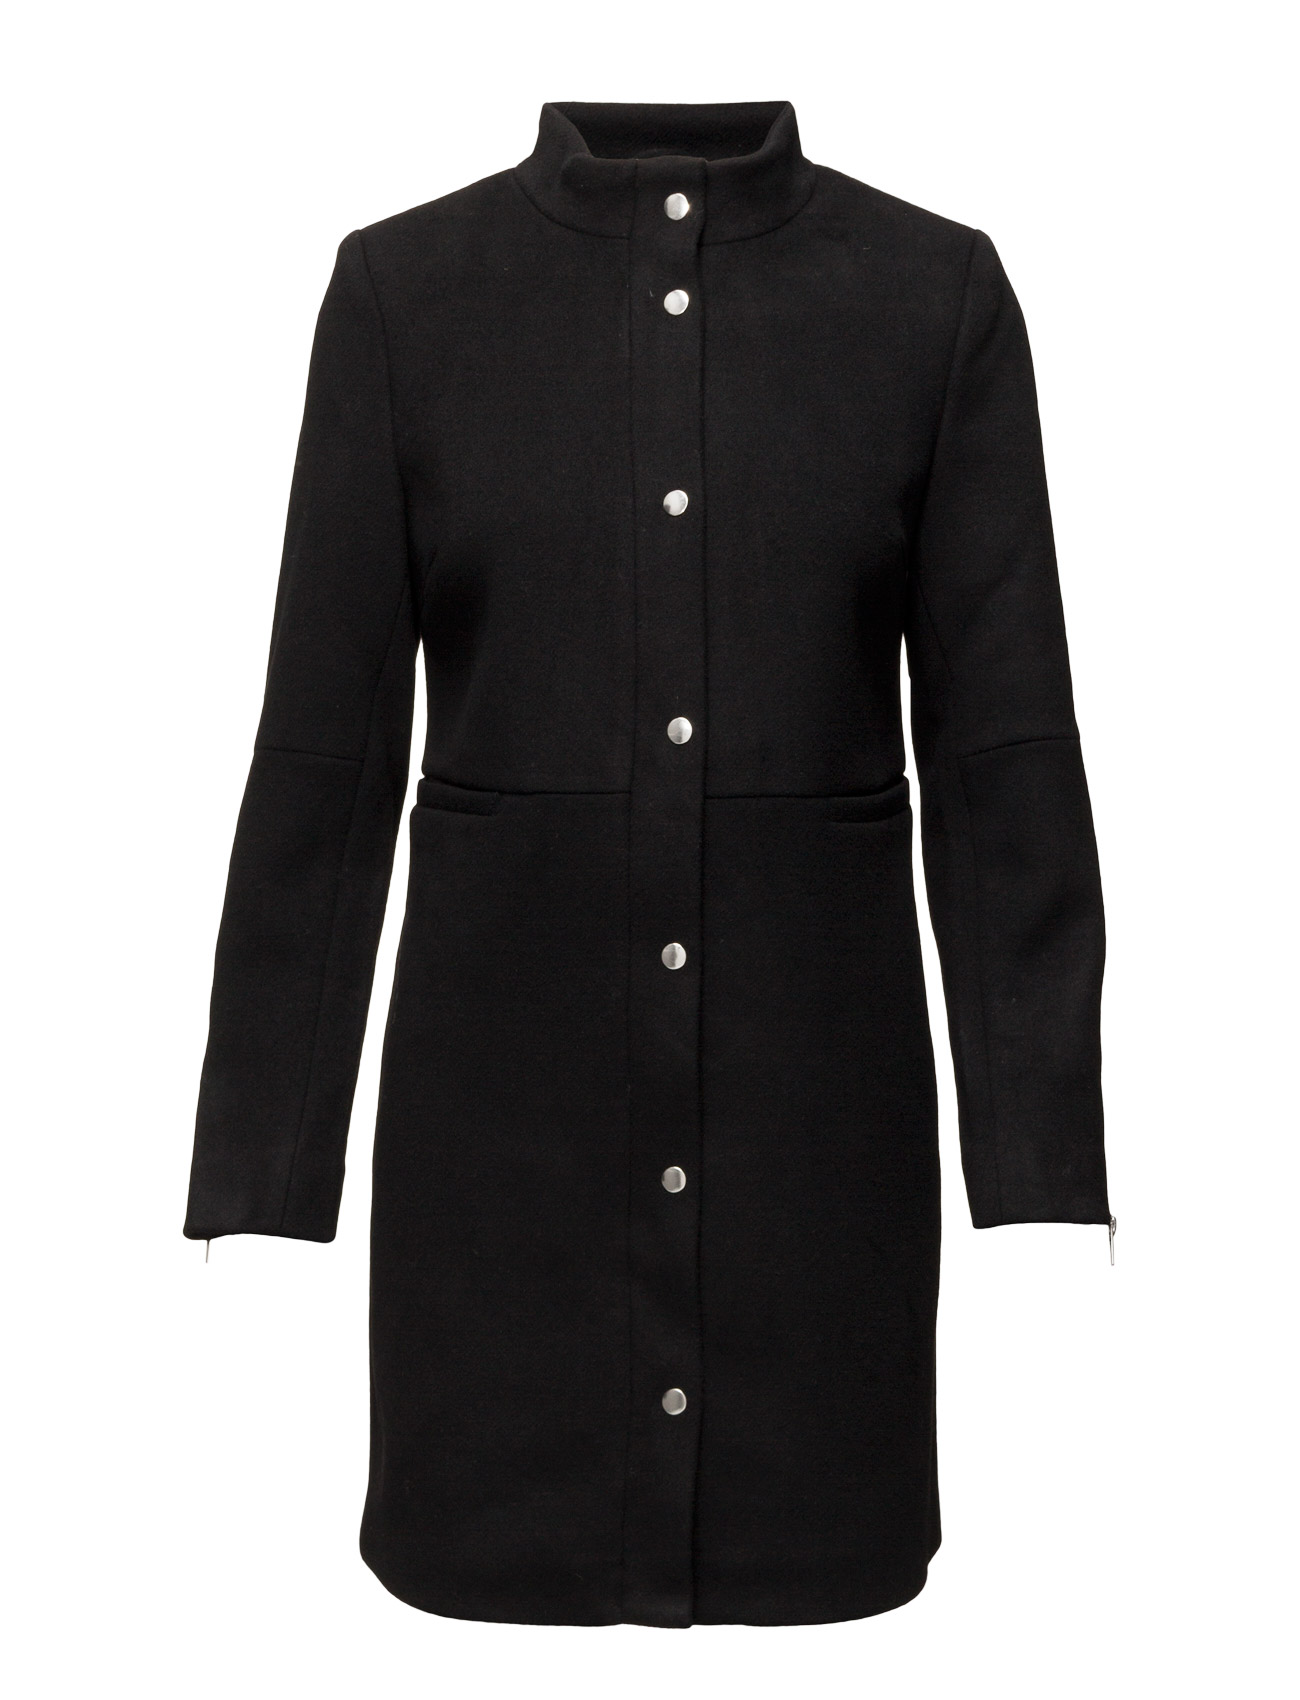 saint tropez – Wool coat på boozt.com dk